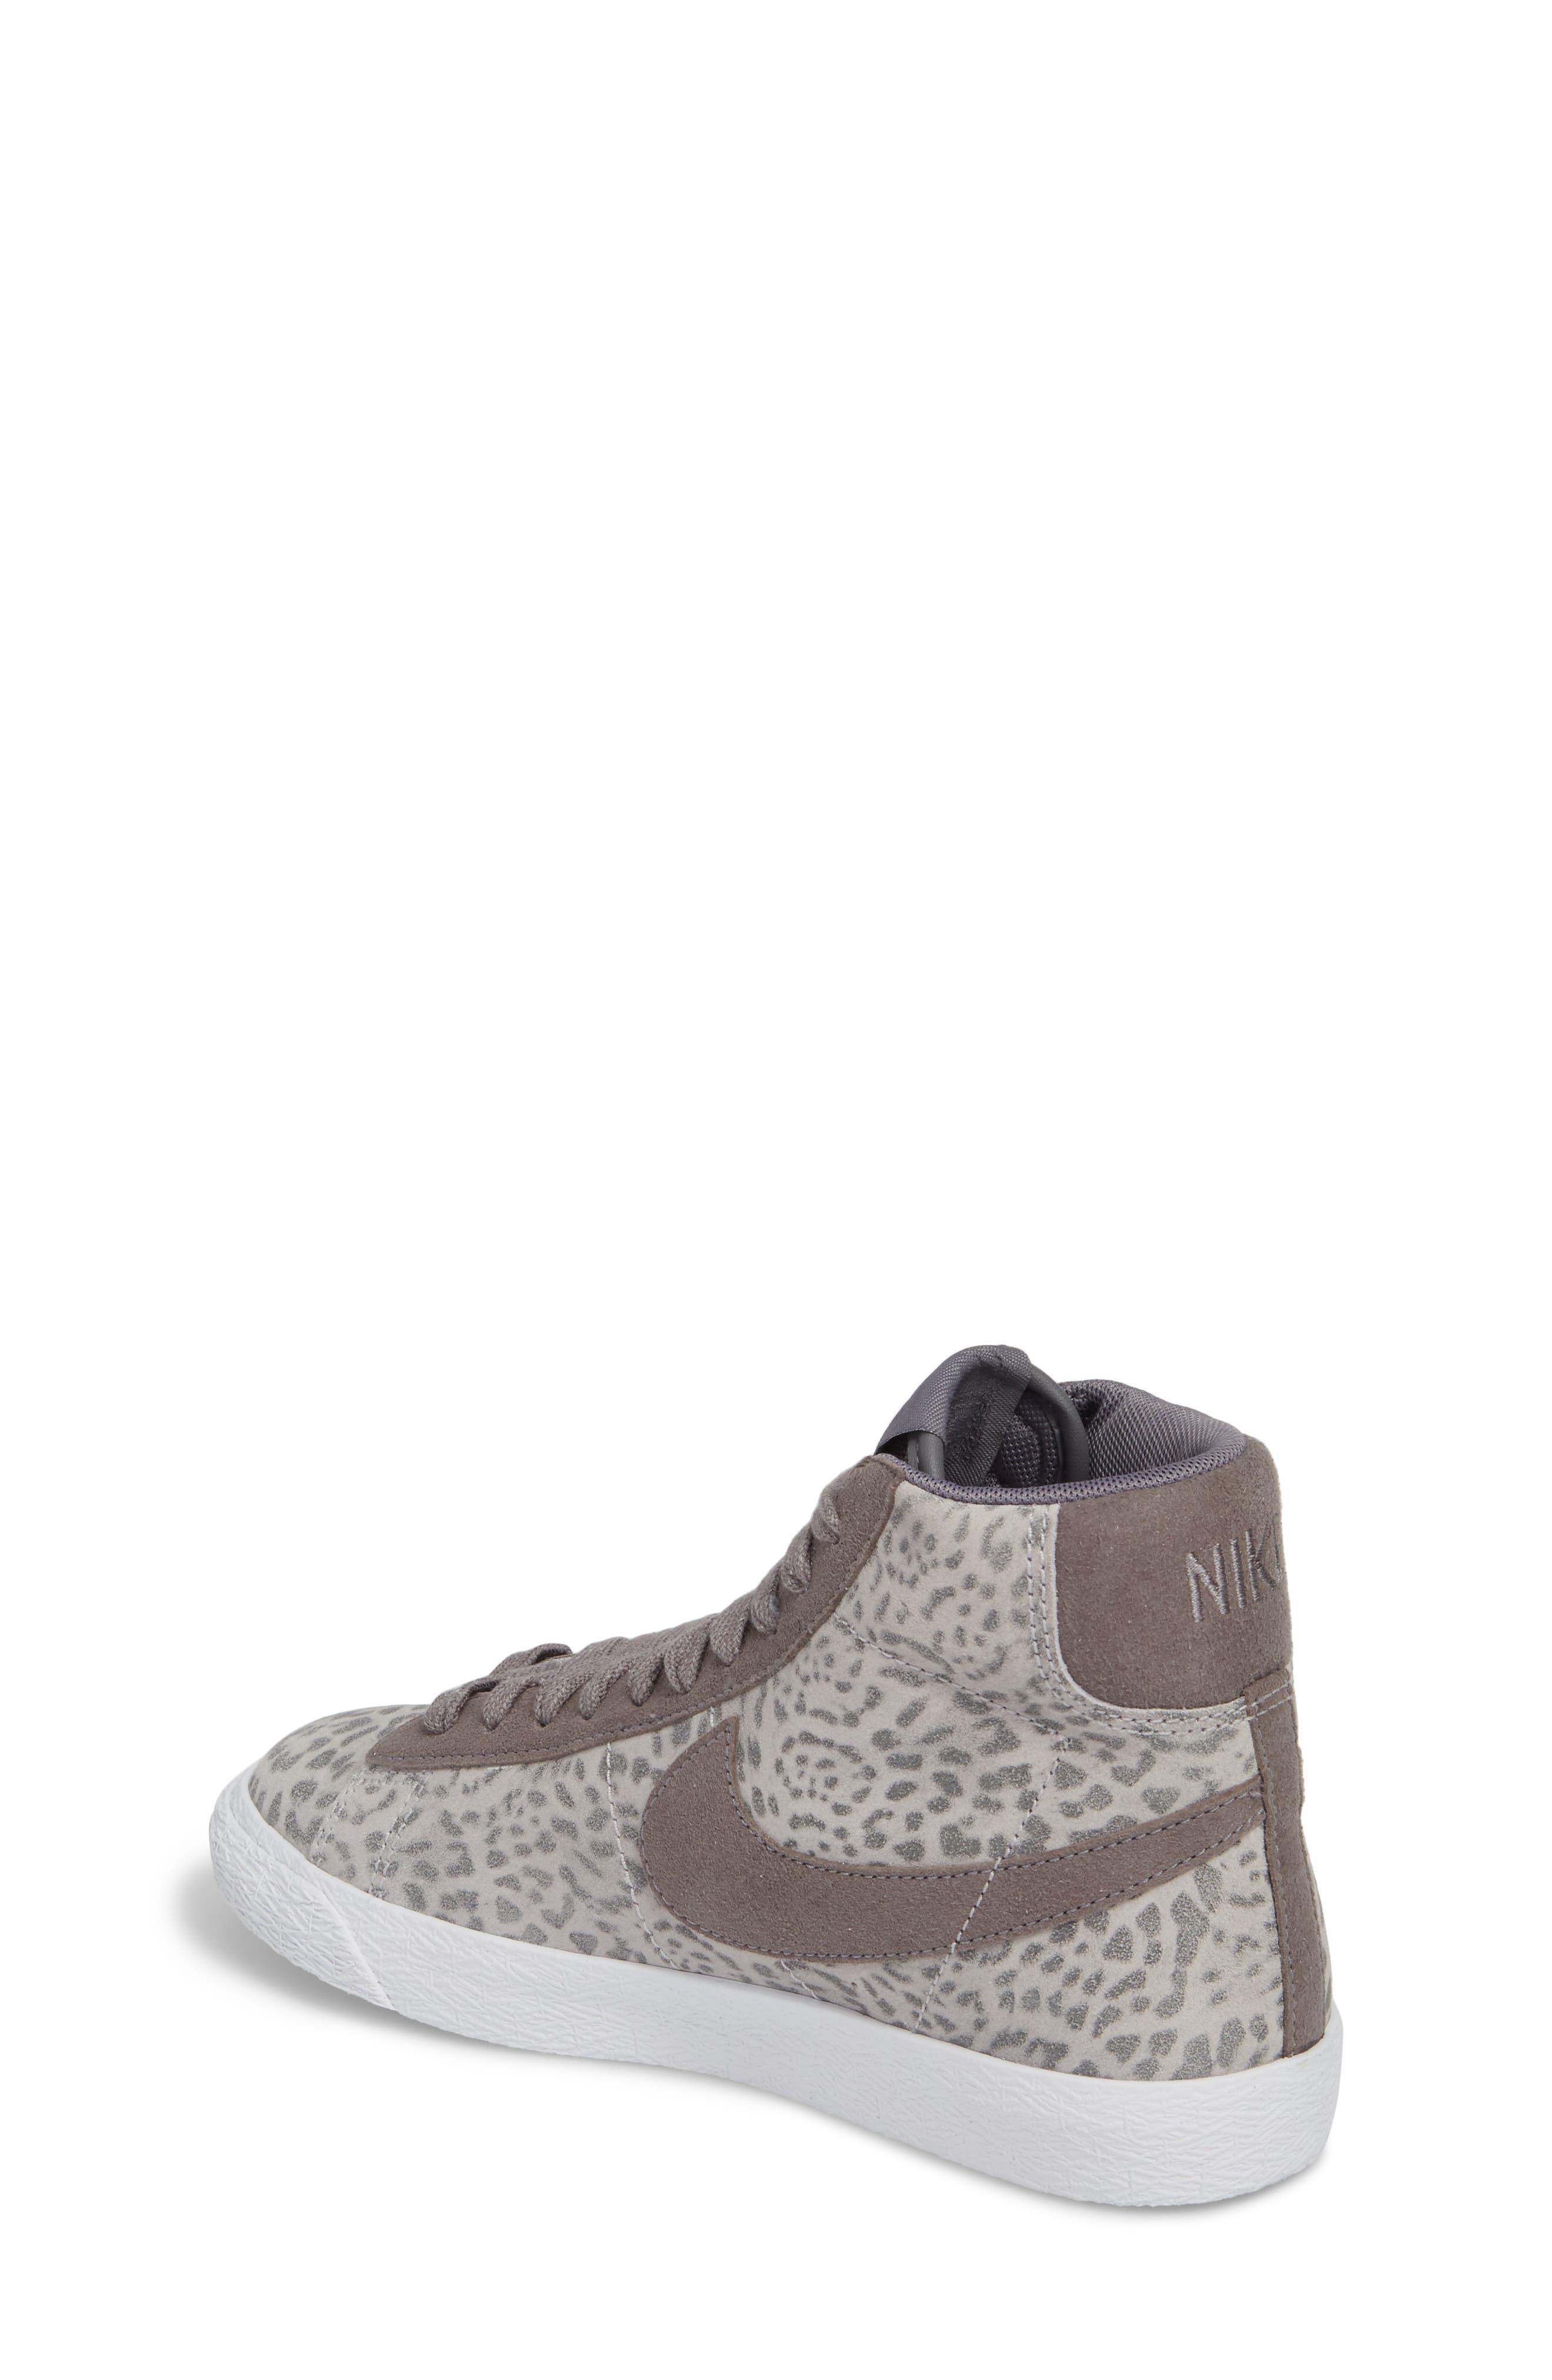 Blazer Mid SE High Top Sneaker,                             Alternate thumbnail 2, color,                             Atmosphere Grey/ Smoke/ Gum